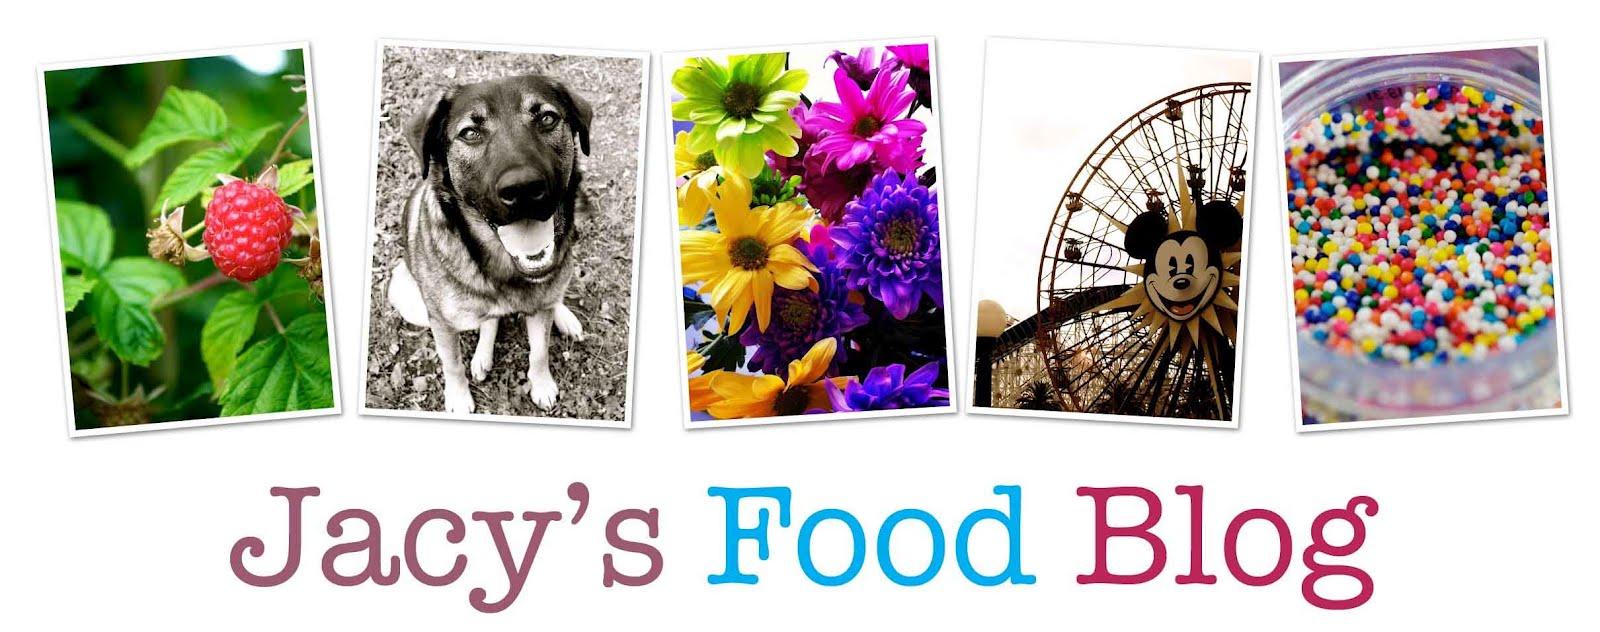 Jacy's Food Blog